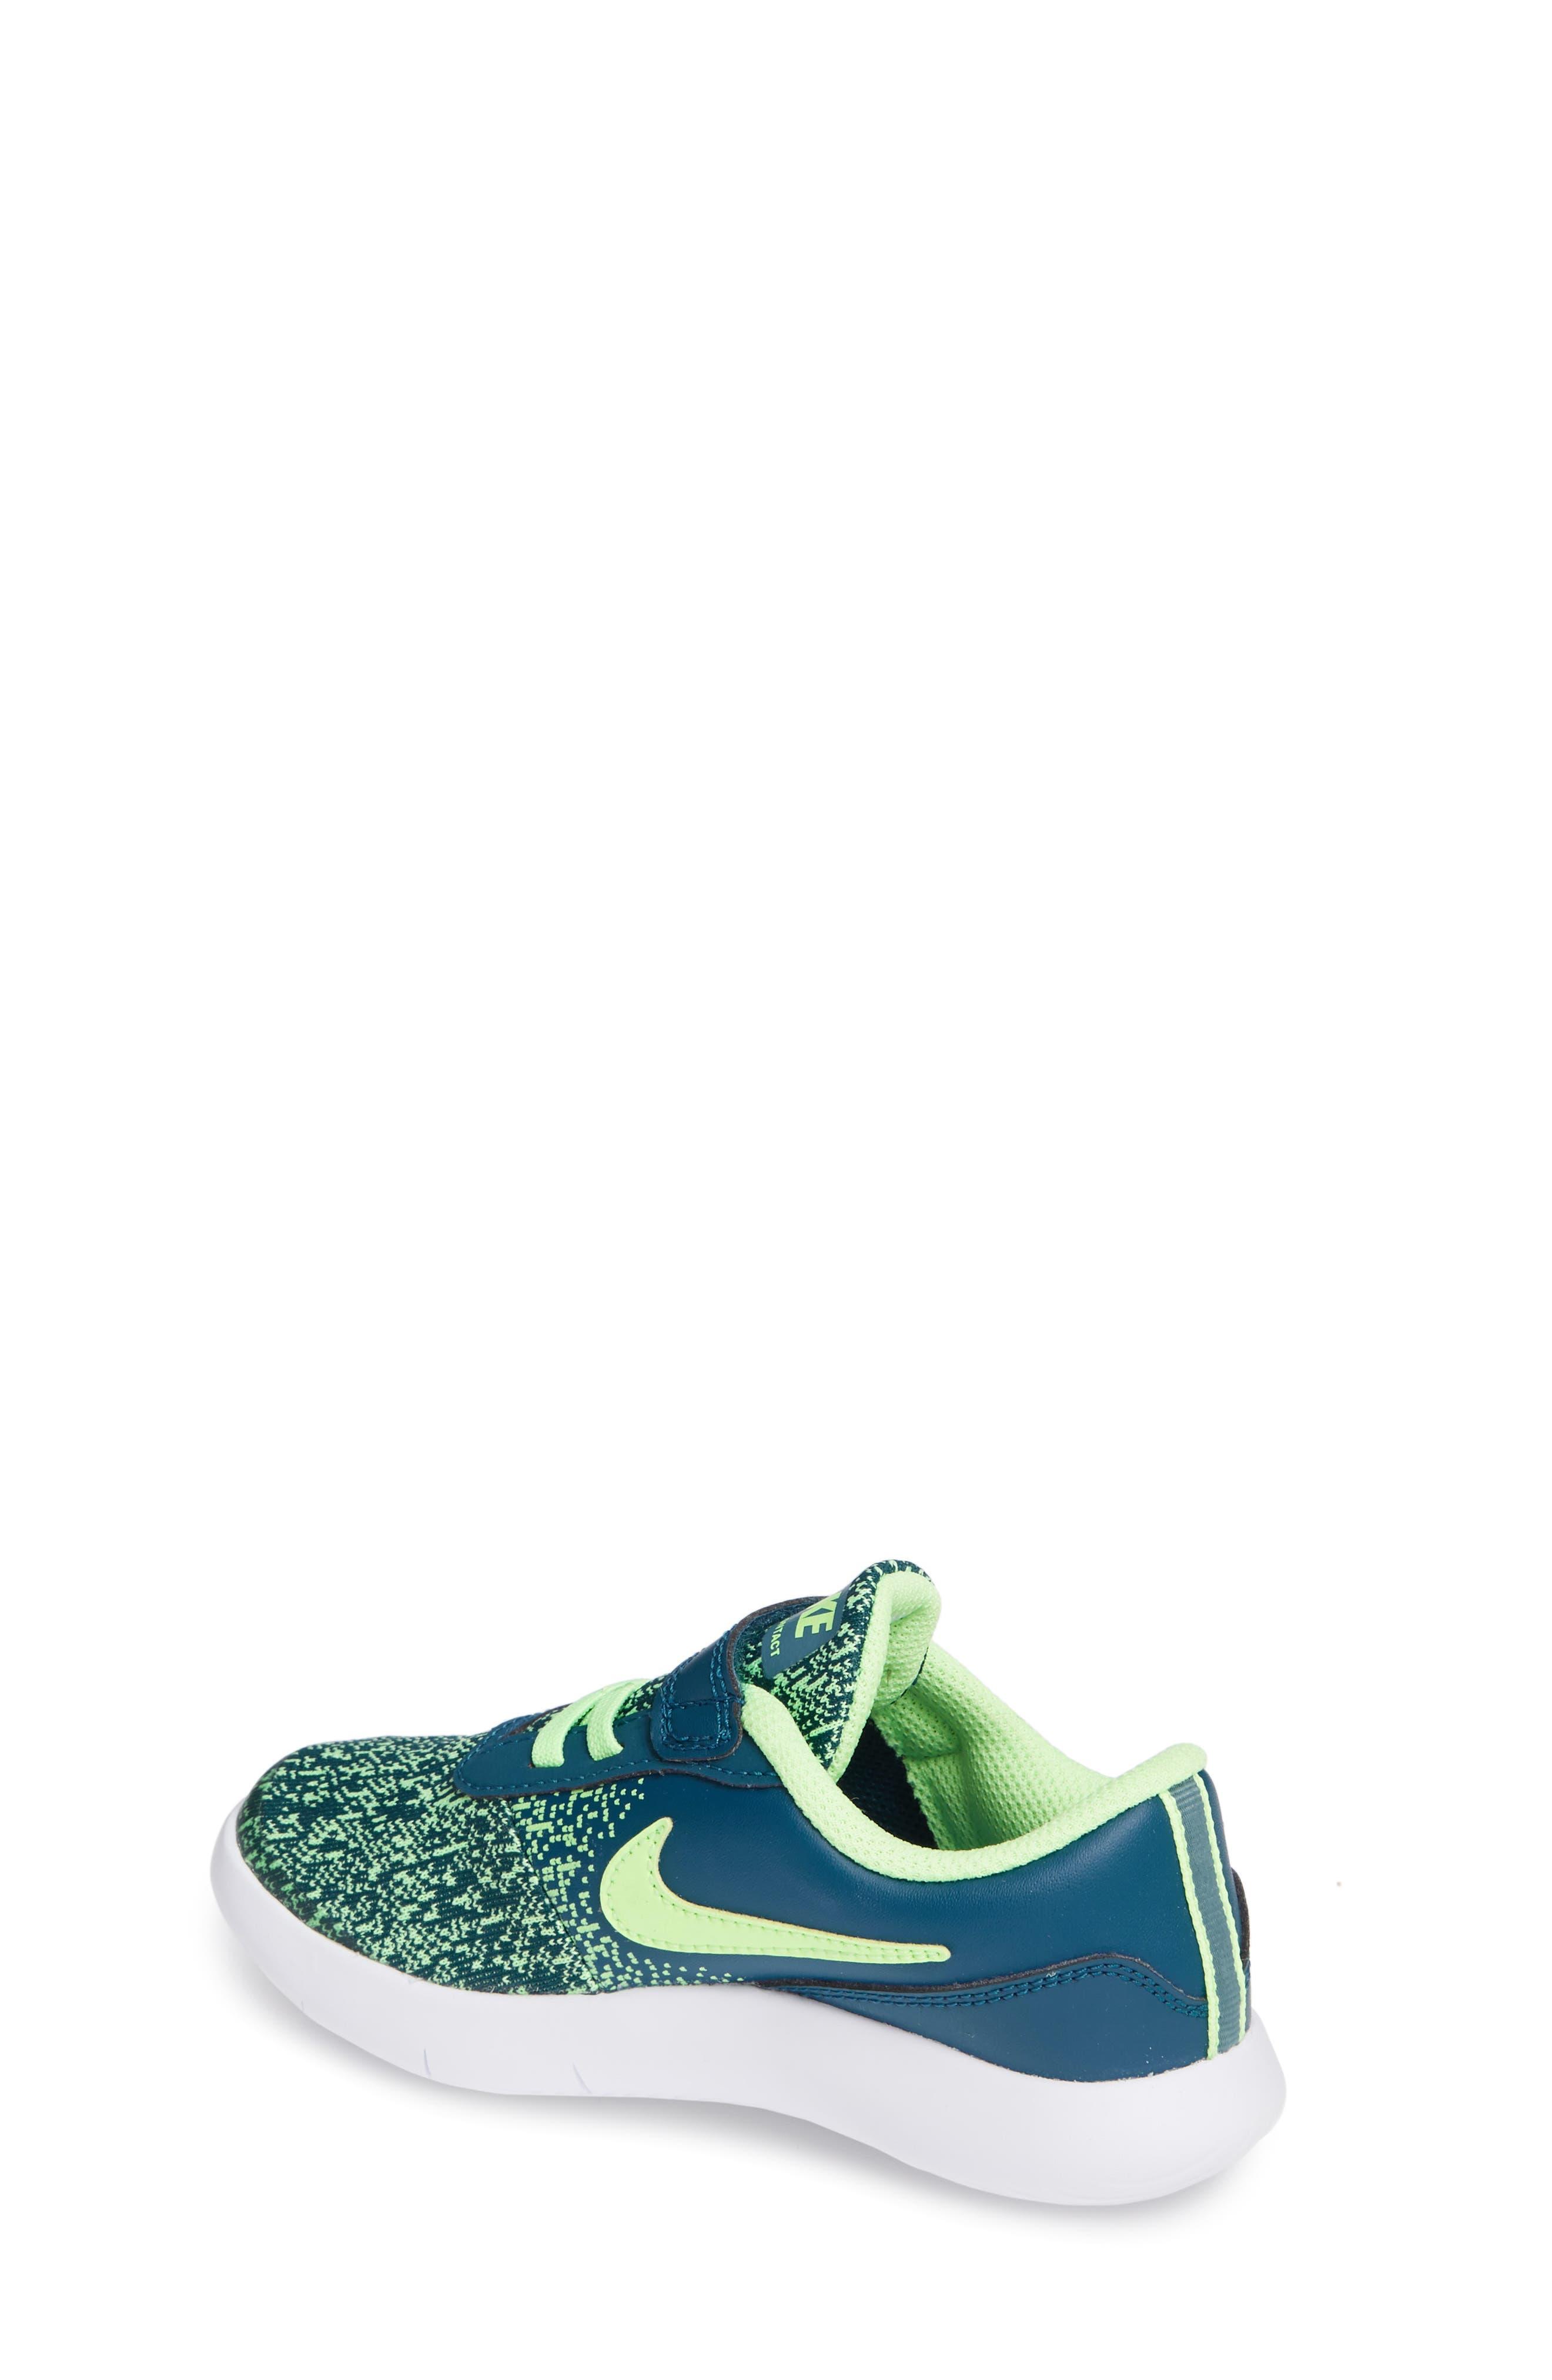 NIKE,                             Flex Contact Running Shoe,                             Alternate thumbnail 2, color,                             BLUE FORCE/ LIME BLAST